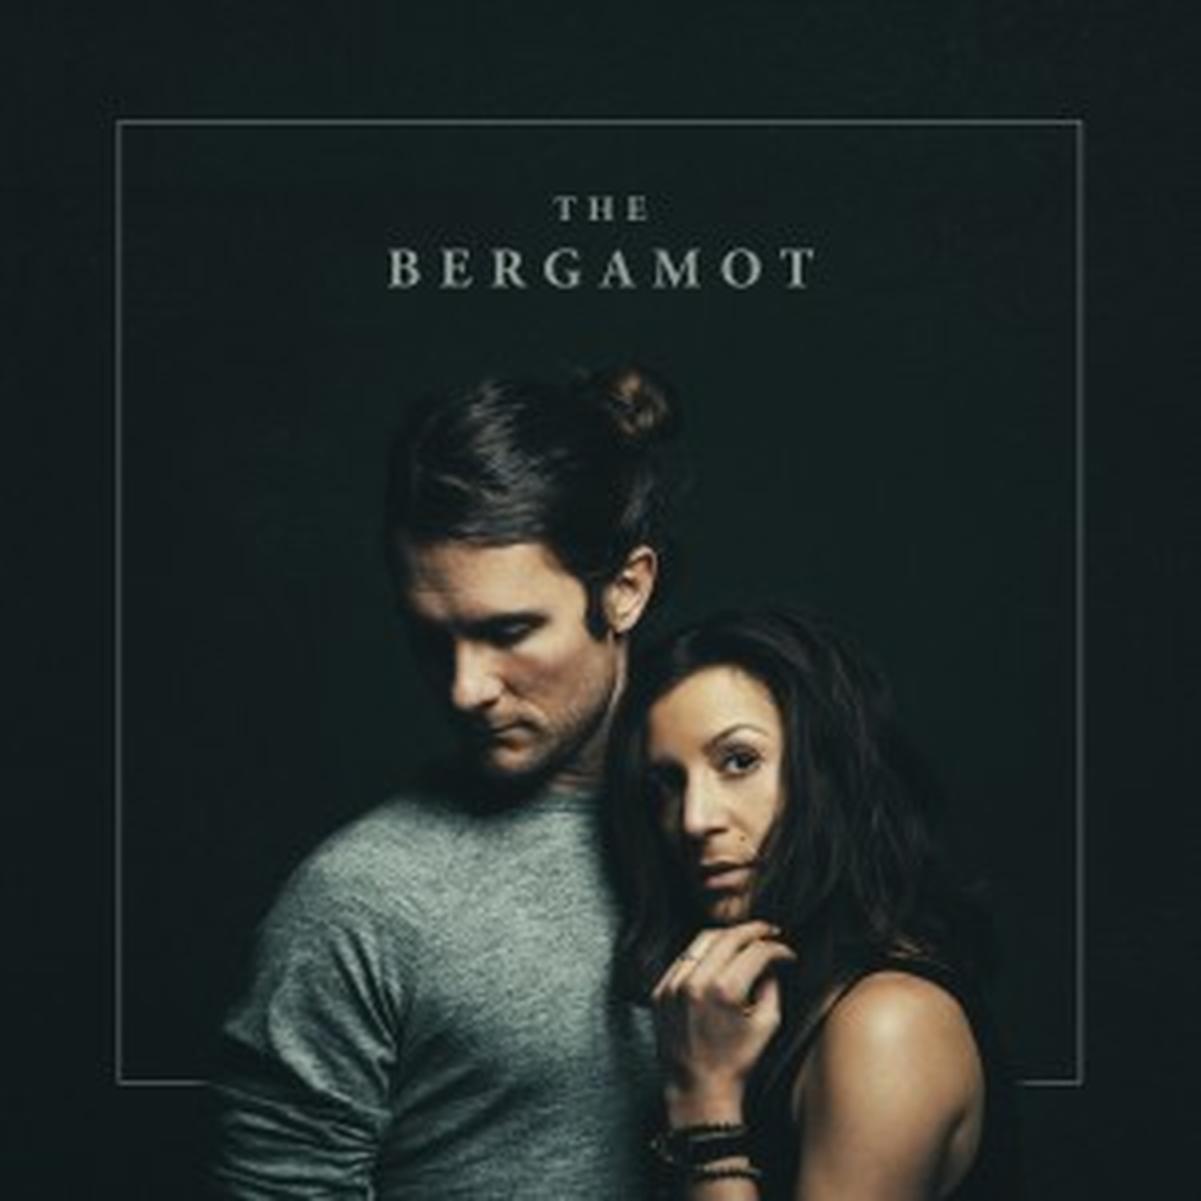 The Bergamot